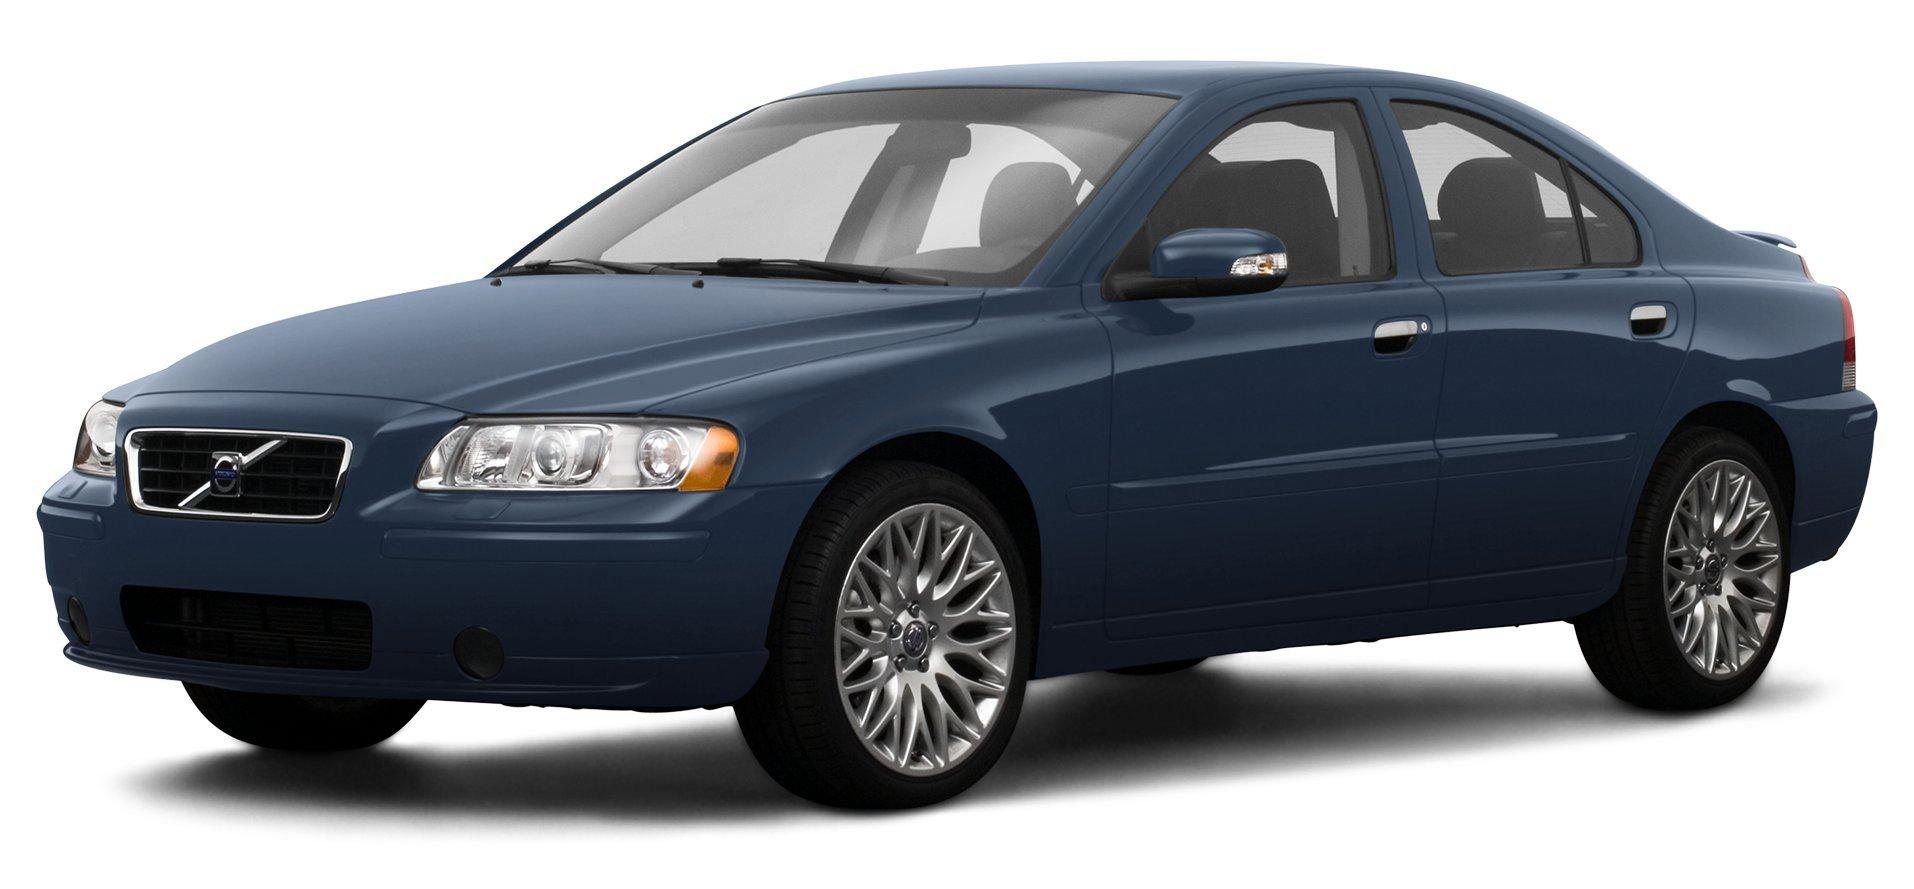 2008 Acura TL, 4-Door Sedan Automatic Transmission, 2008 Volvo S60 2.4T T5  w/Sunroof, 4-Door Sedan Front Wheel ...